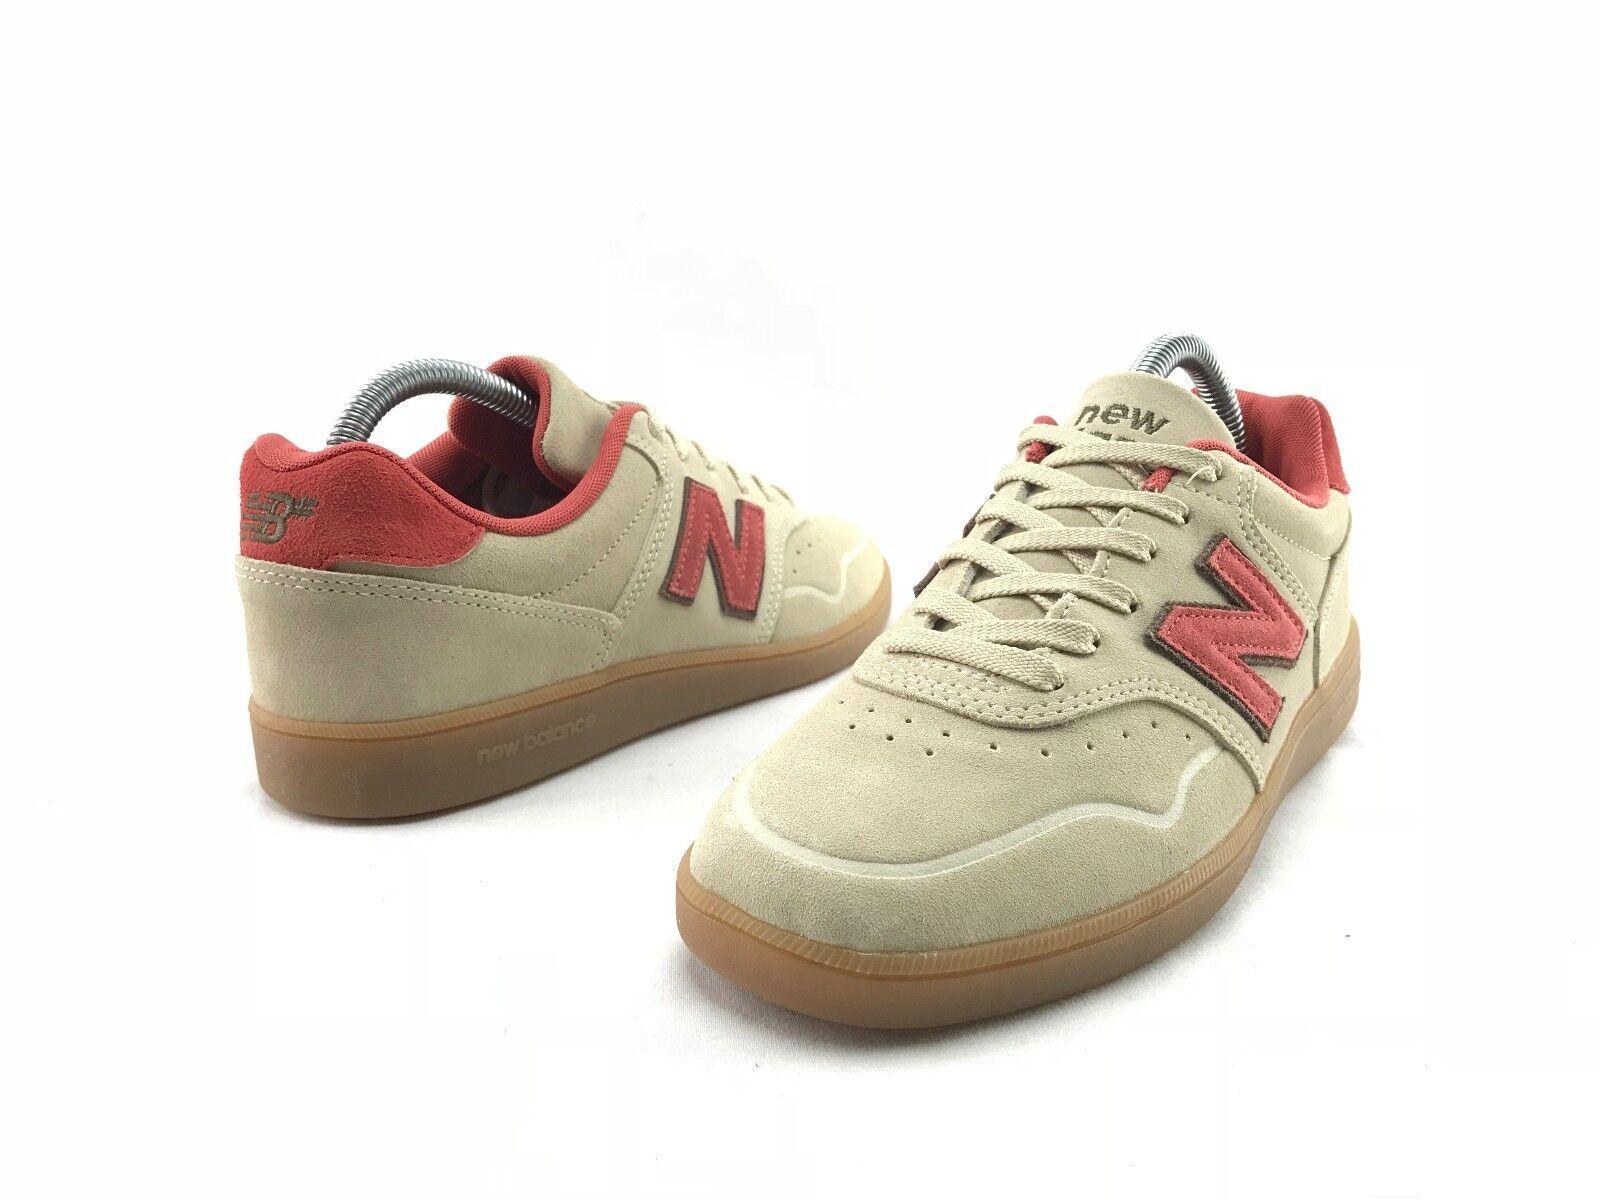 Nuovo equilibrio 288 classici uomini allacciarsi le scarpe beige da ginnastica ci beige scarpe 7,5 7 d scarpe b710 186a05